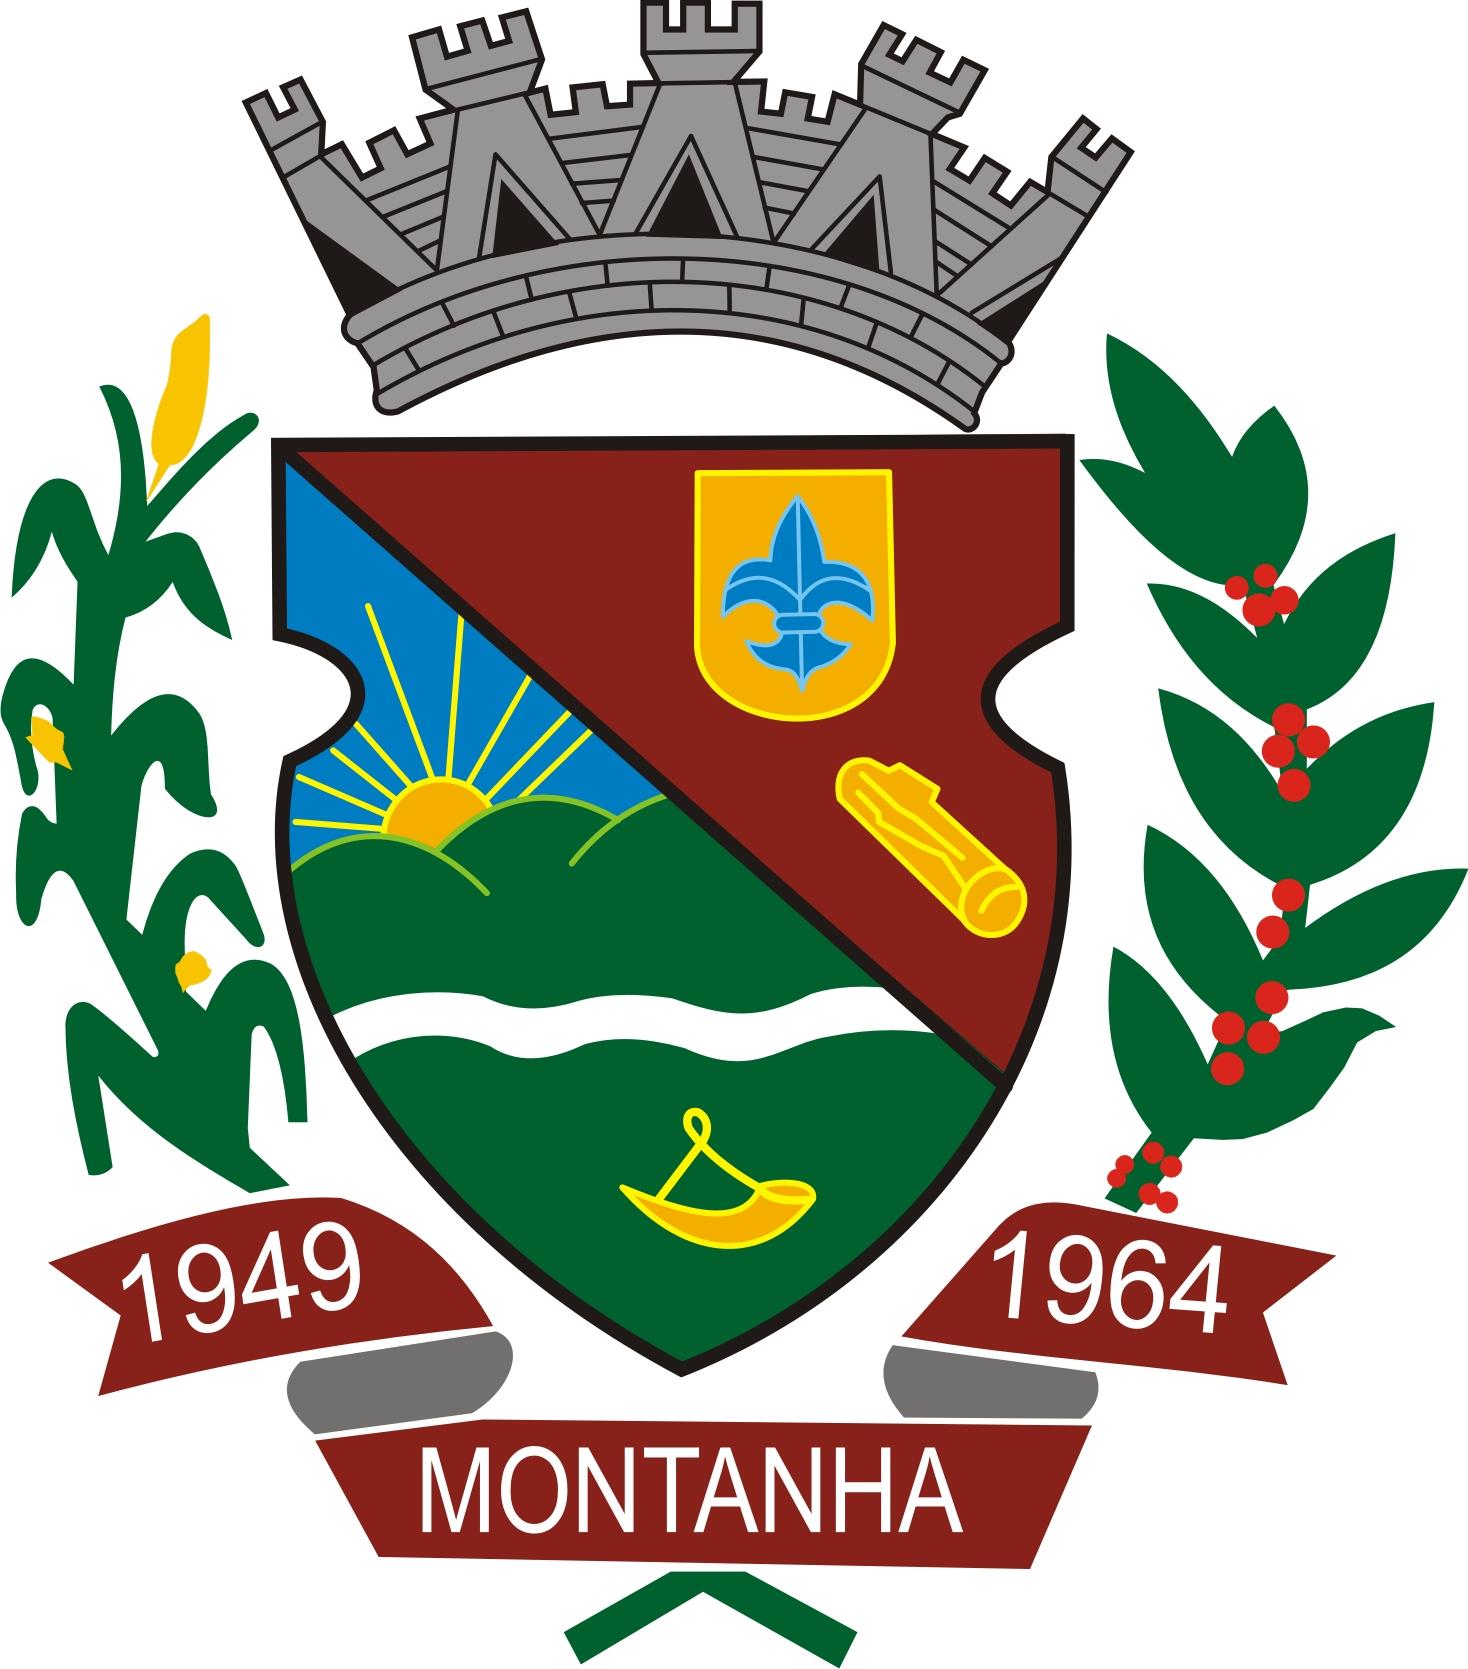 Montanha Espírito Santo fonte: upload.wikimedia.org